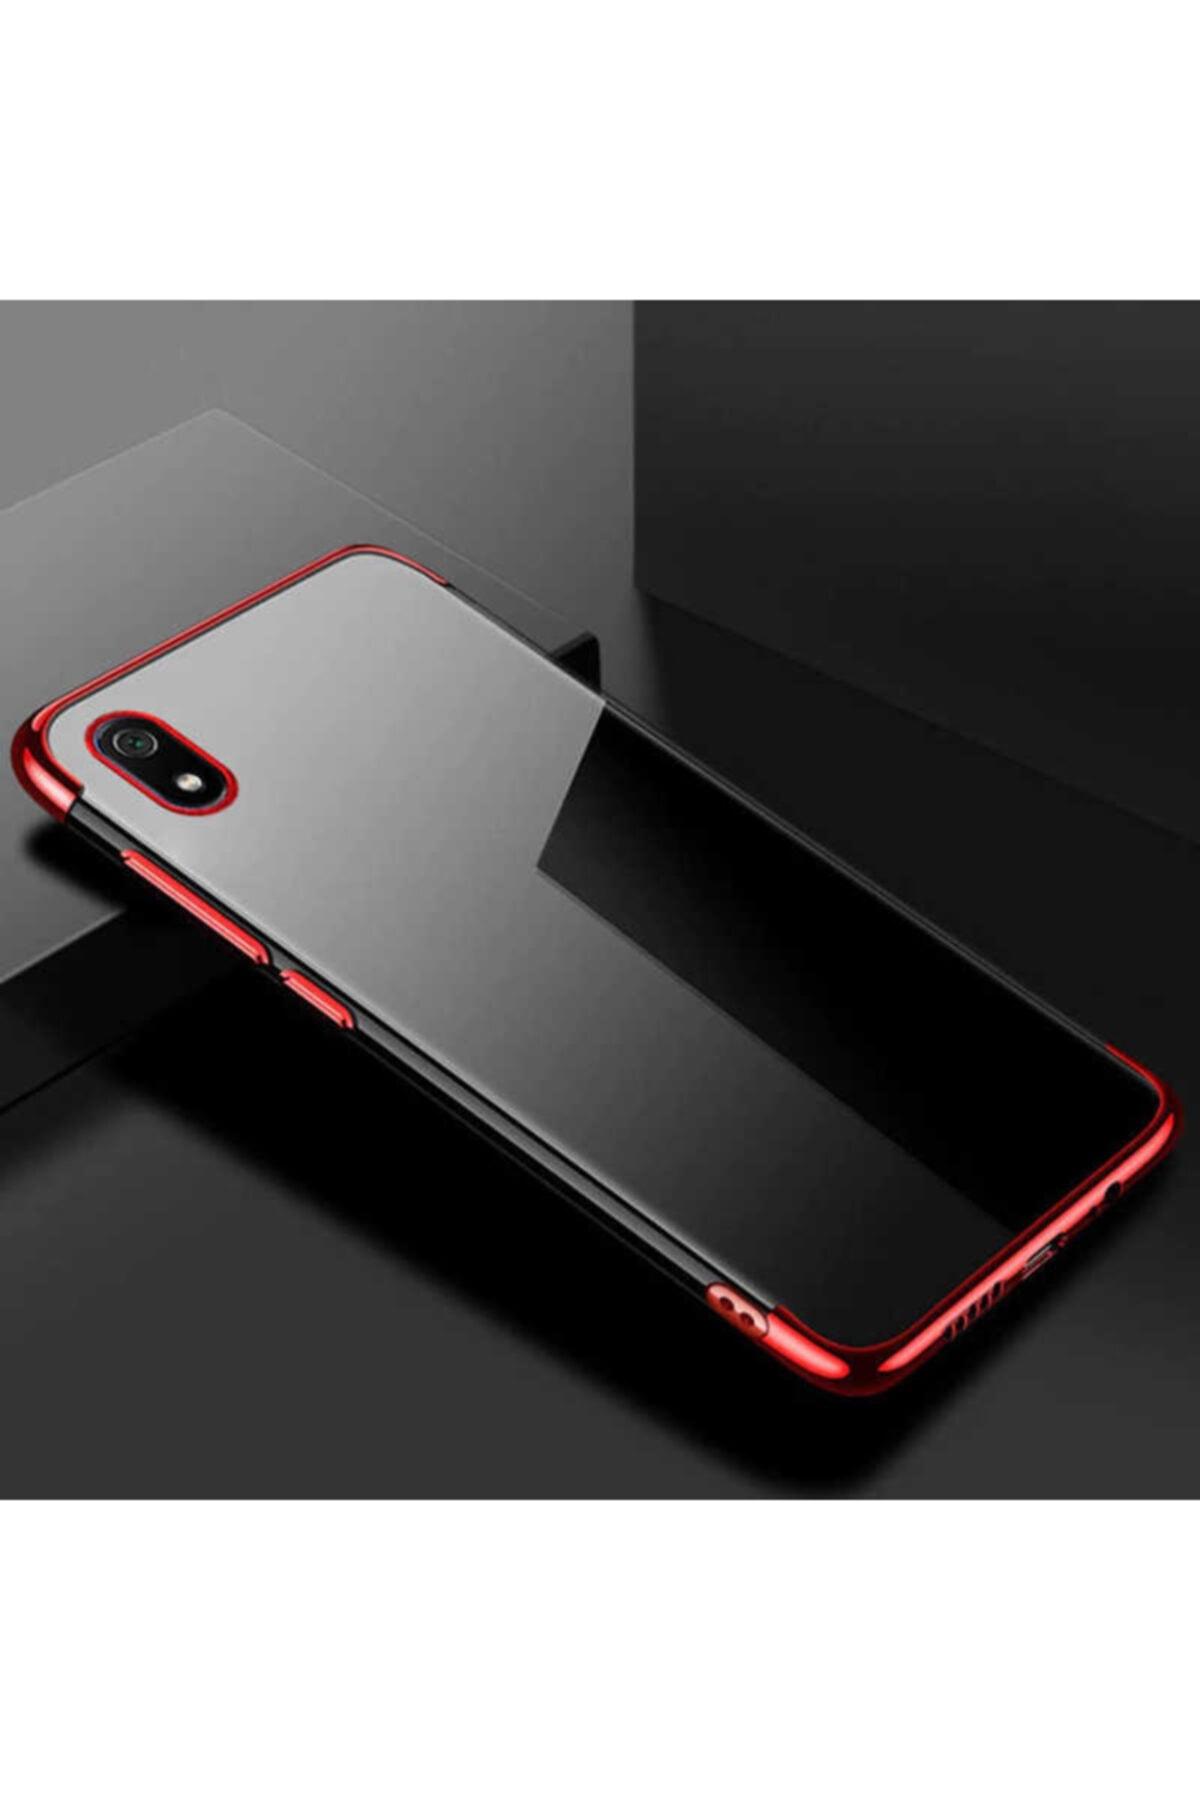 ankacep Xiaomi Redmi 7a Kılıf Dört Köşeli Lazer Silikon Kapak 1